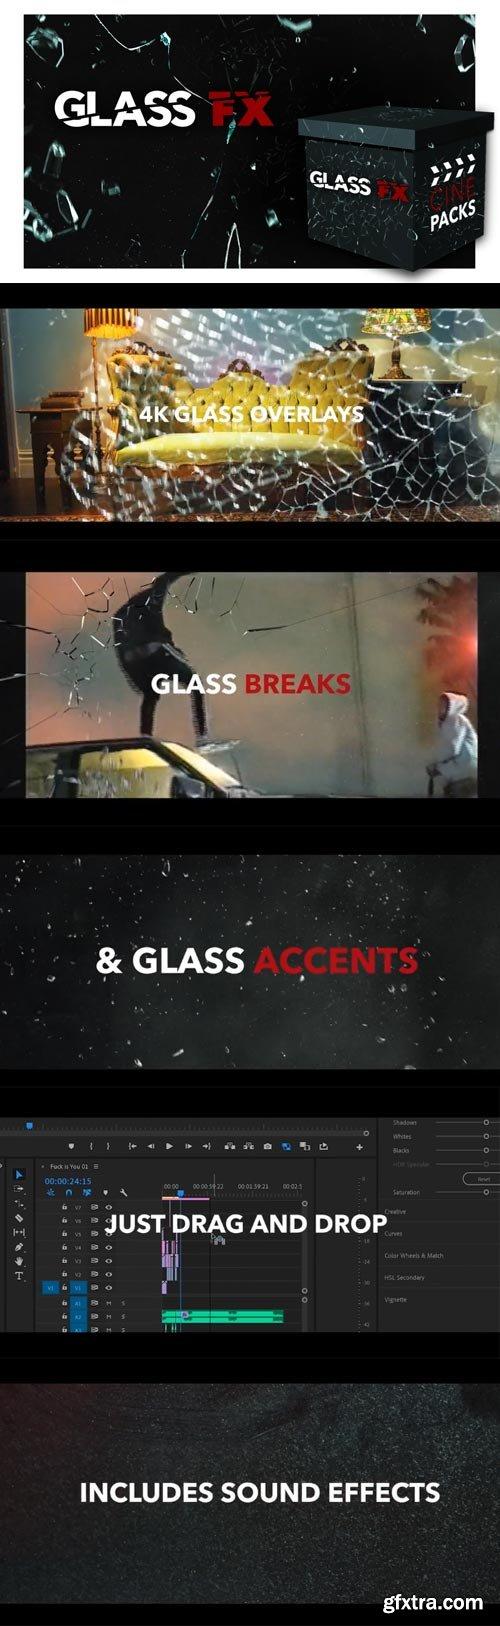 CinePacks - Glass FX